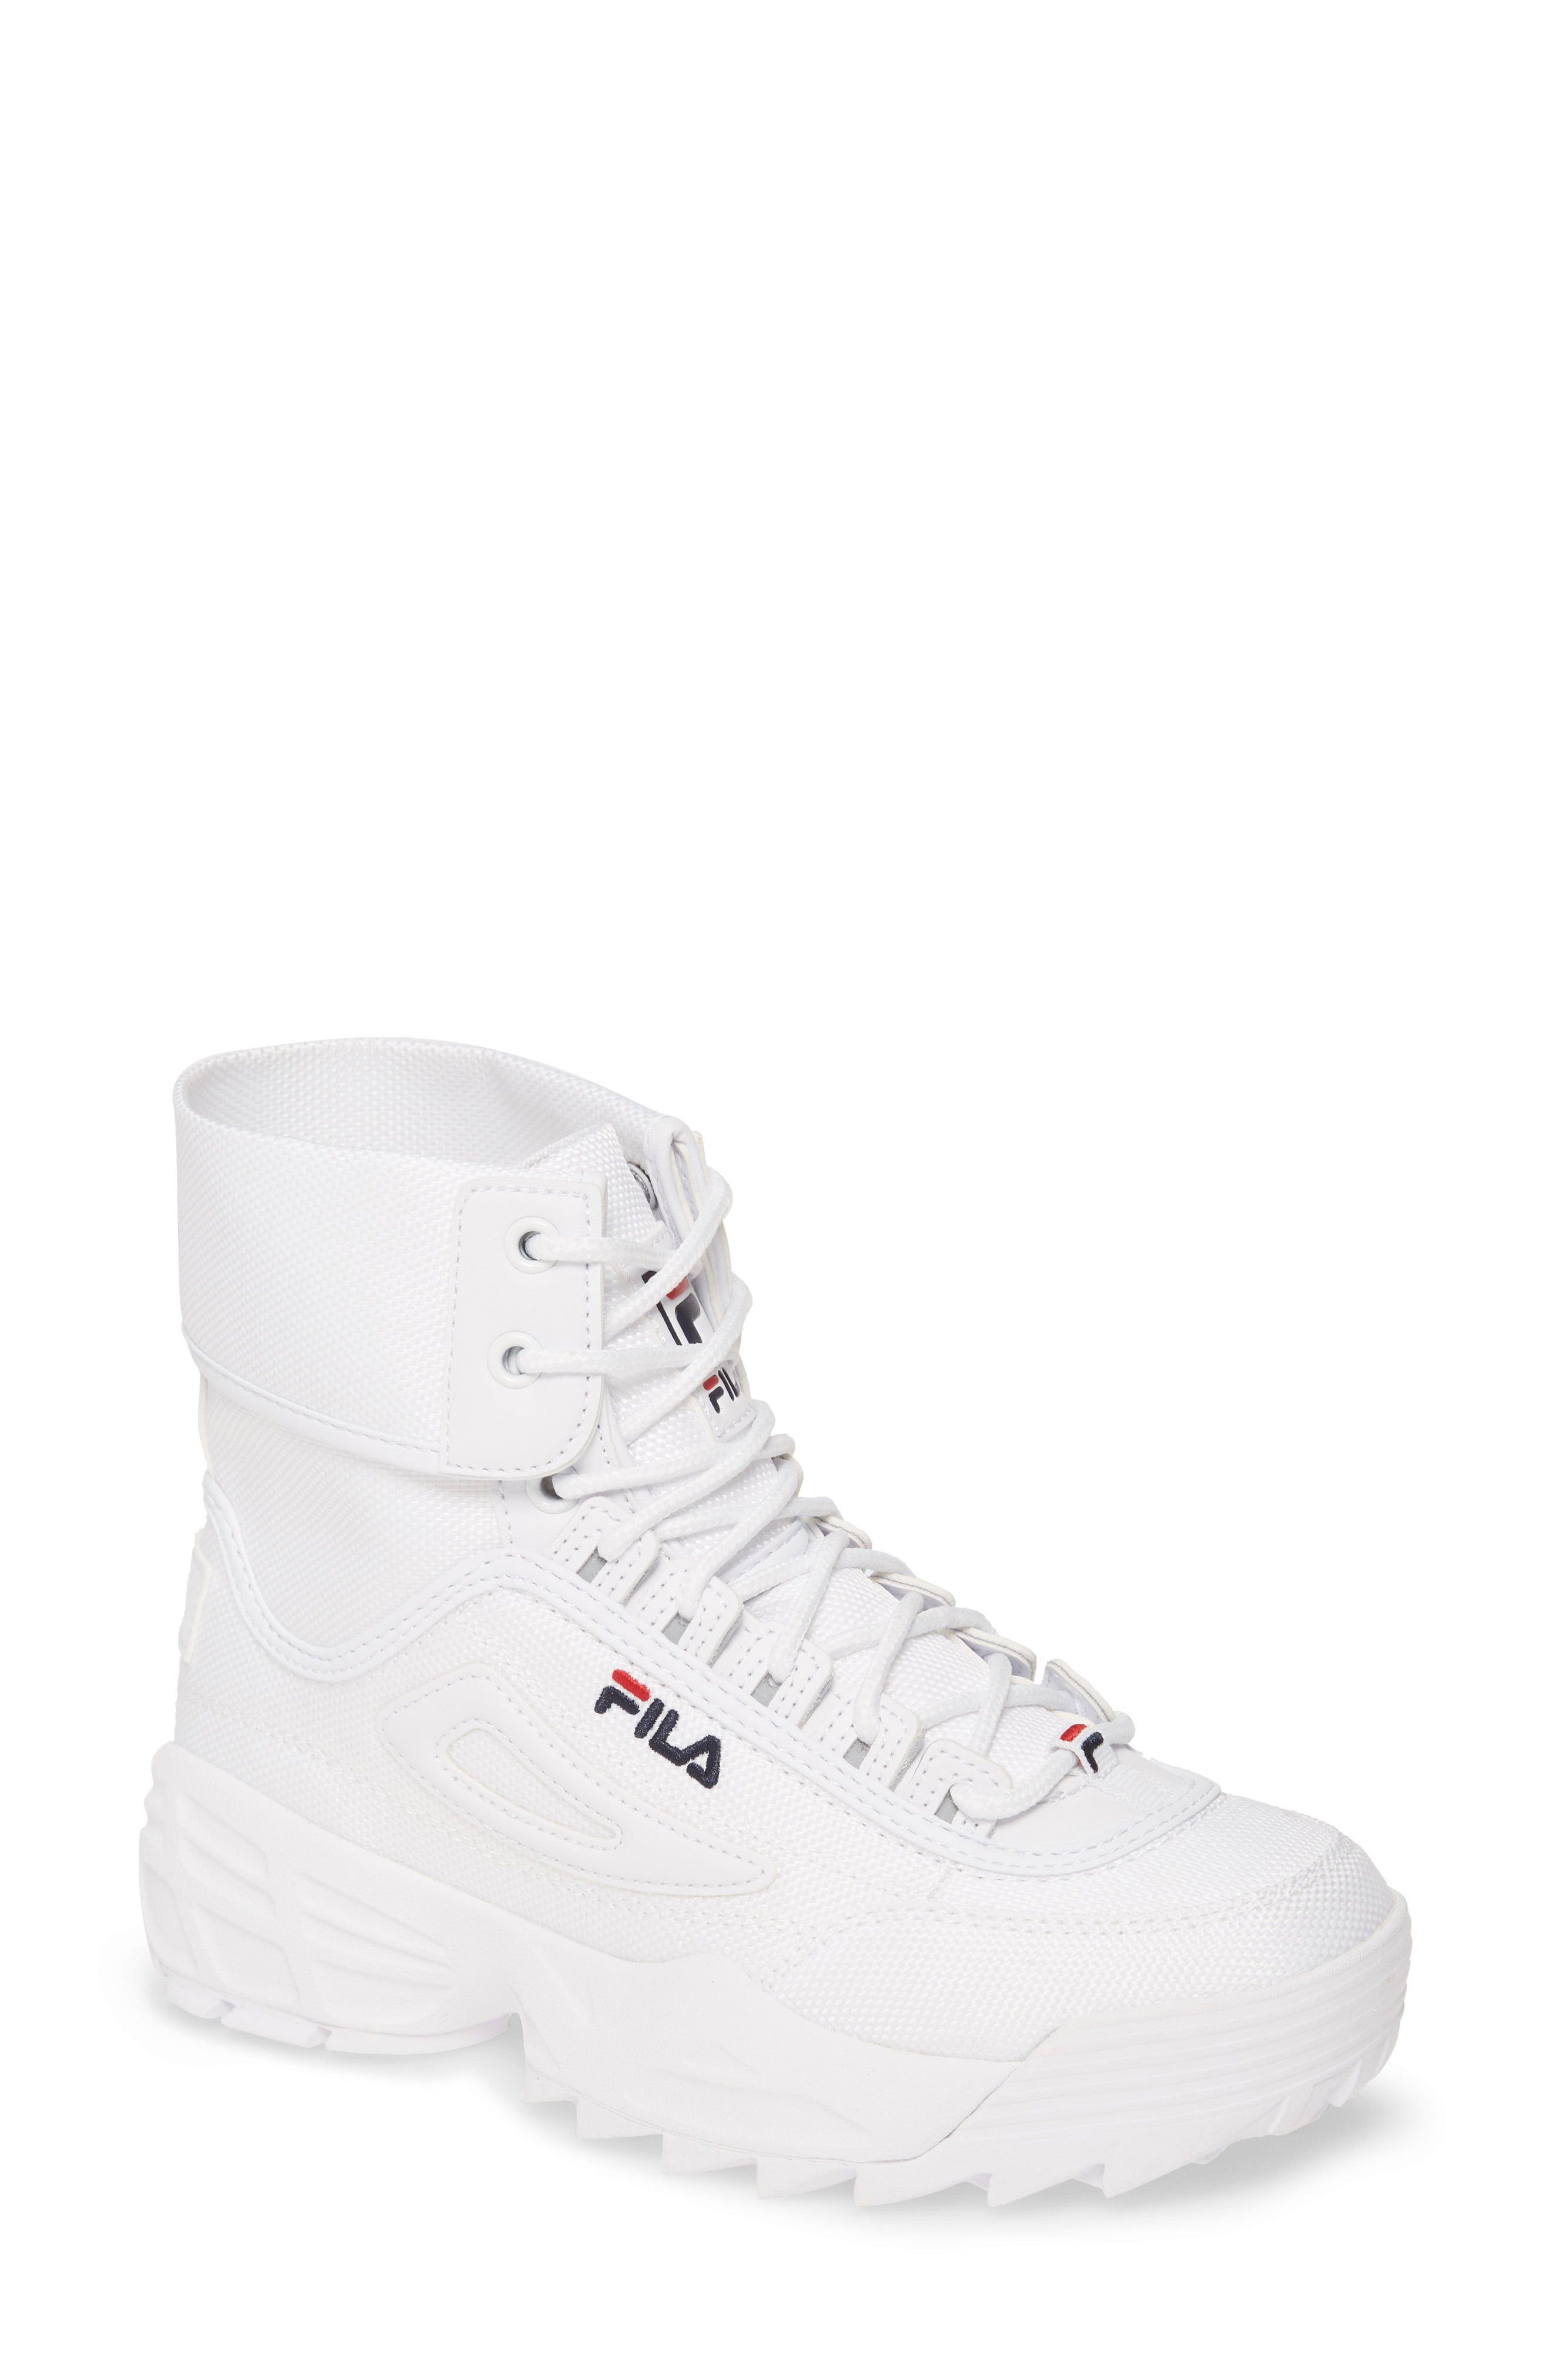 Fila Shoes For Men | Sneaker boots, Top